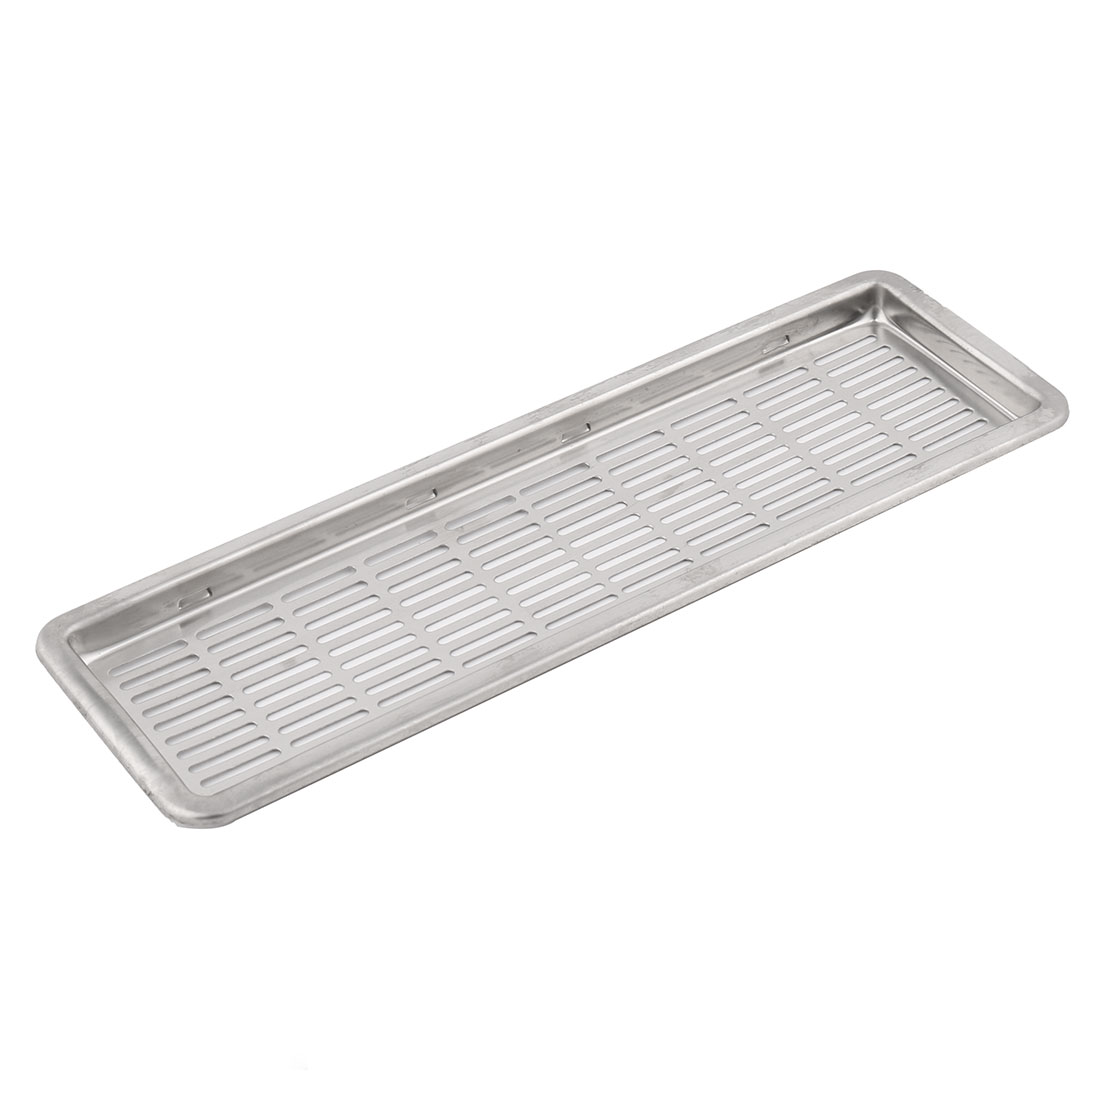 Metal Rectangle Shape Mesh Hole Design Air Vent Ventilation Louvers Silver Tone